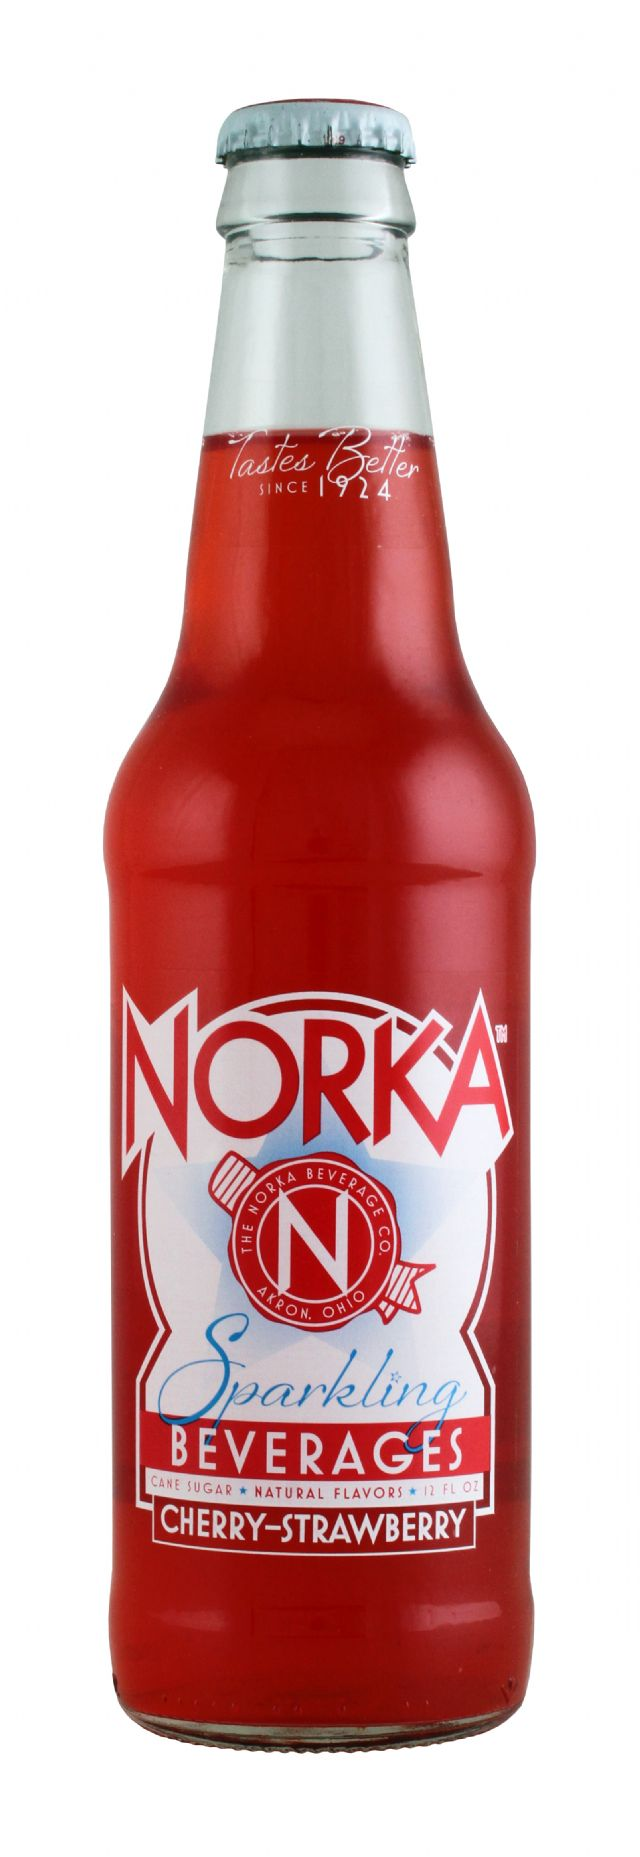 Norka Sparkling Beverages: Norka CherryStraw Front